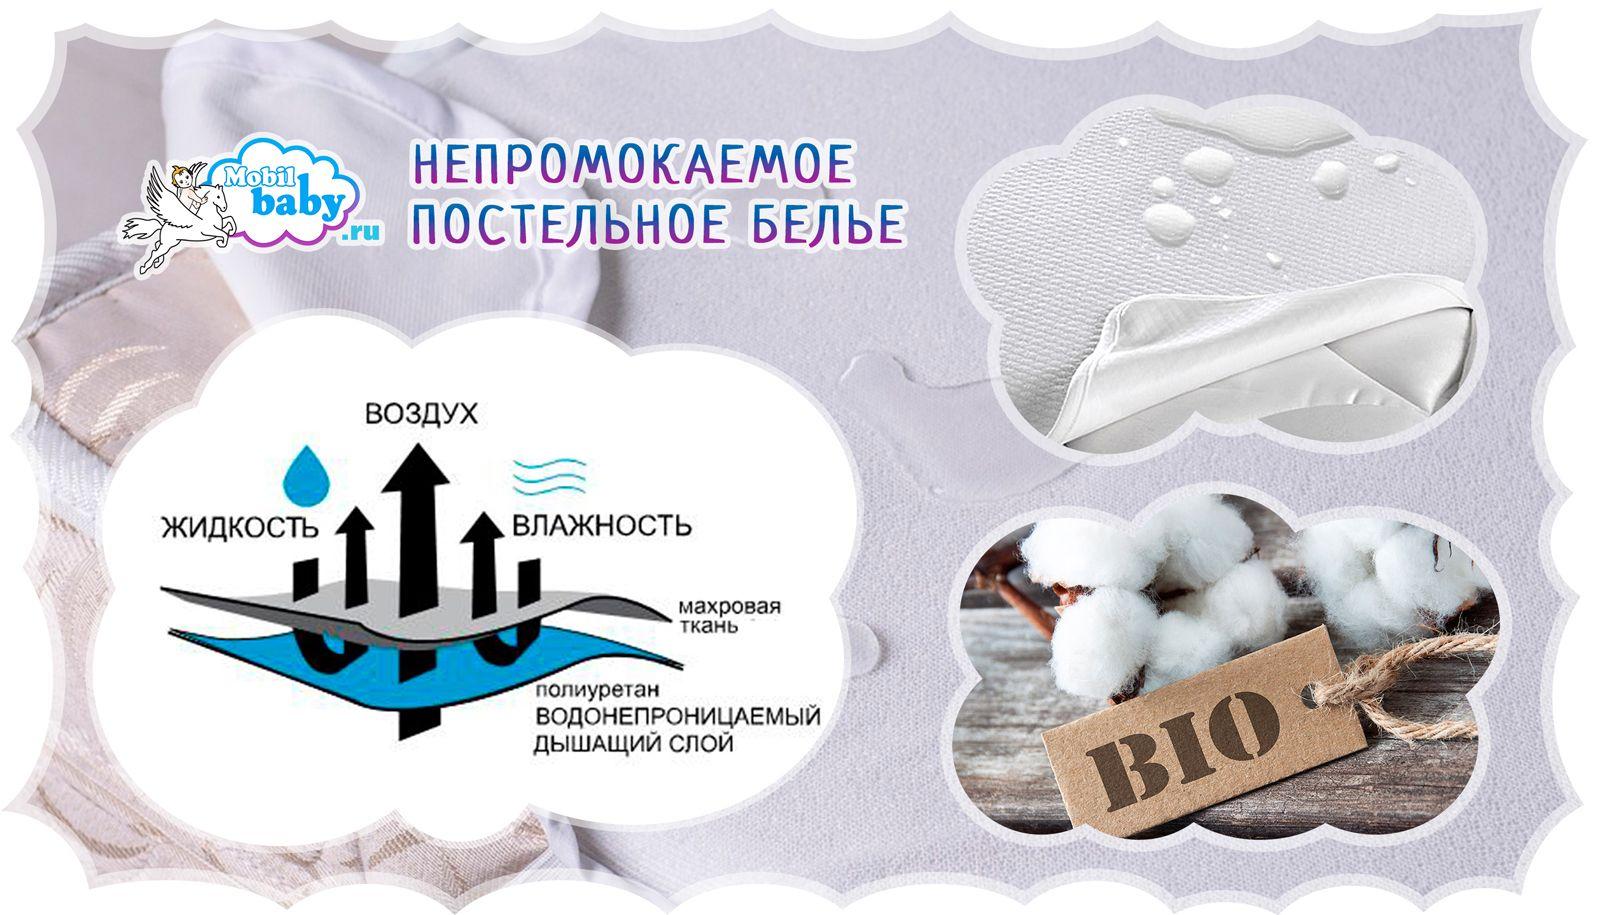 2-1-Nepromokaemoe-postelnoe-bele